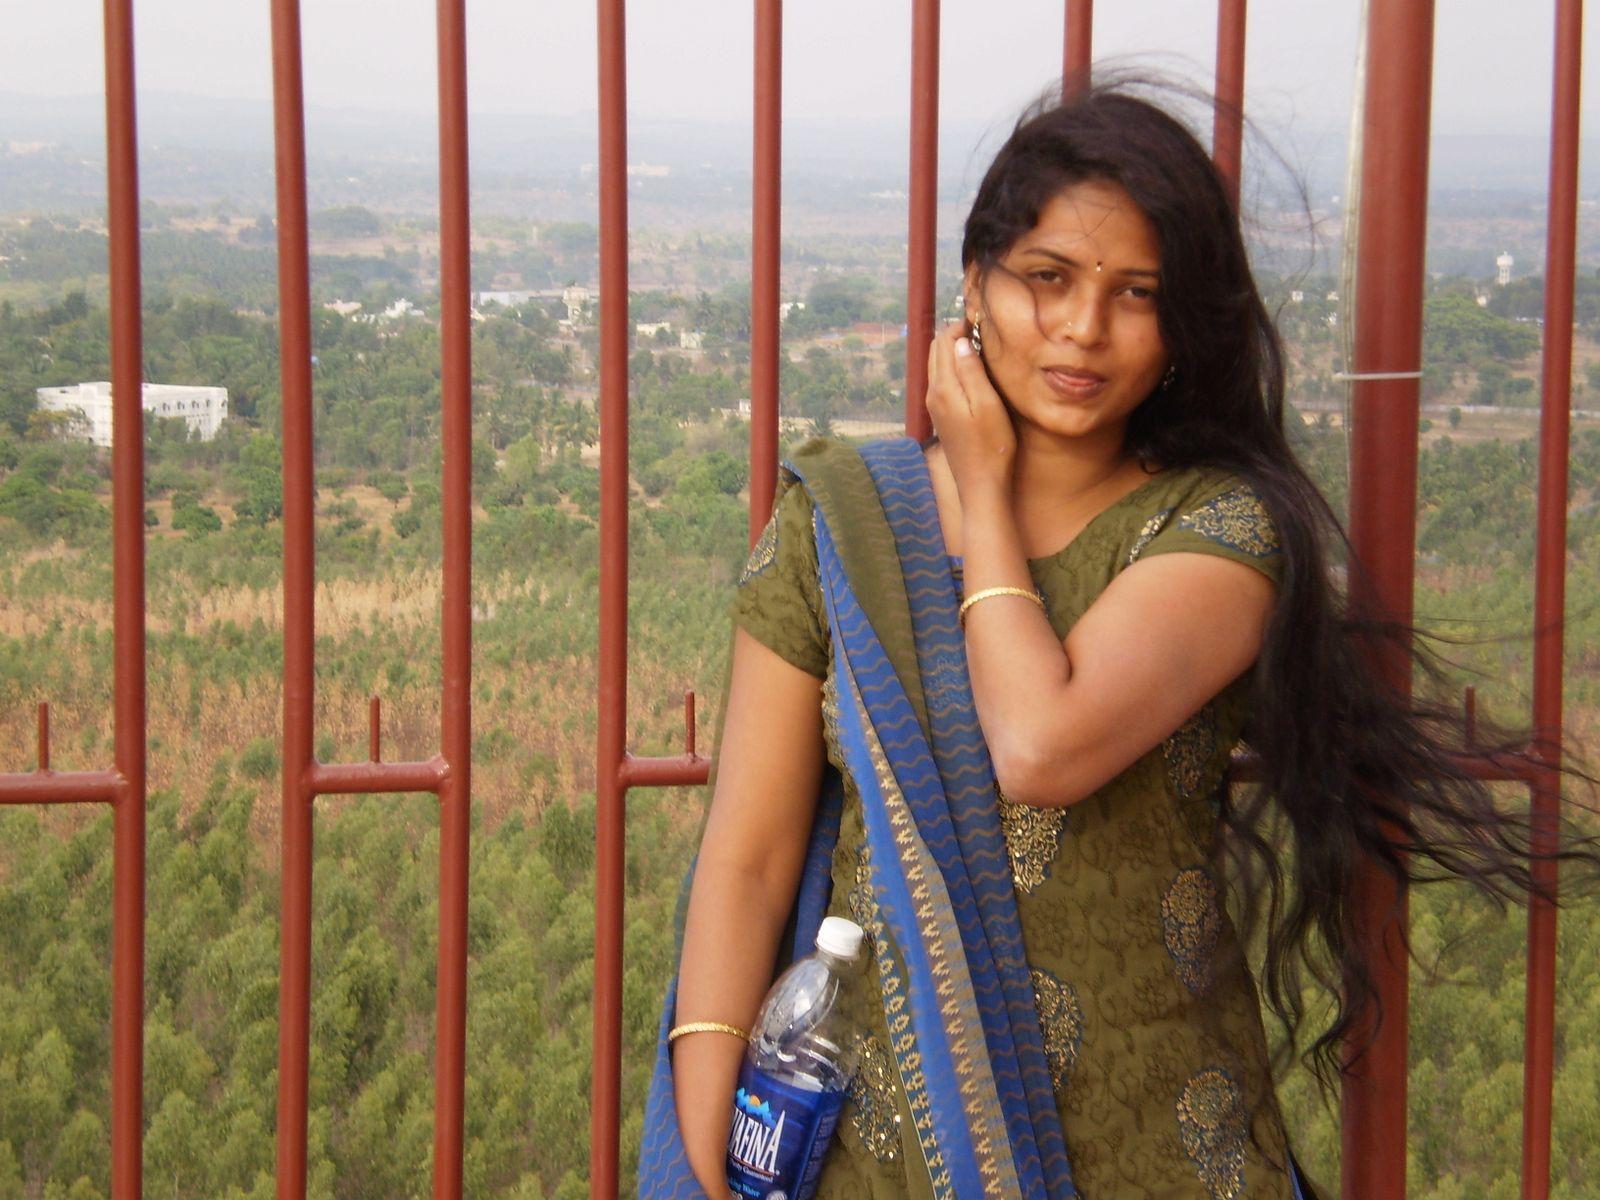 TAMASHA BLOG: Indian HW Neha Casual Non-Nde Pics 02 - Last